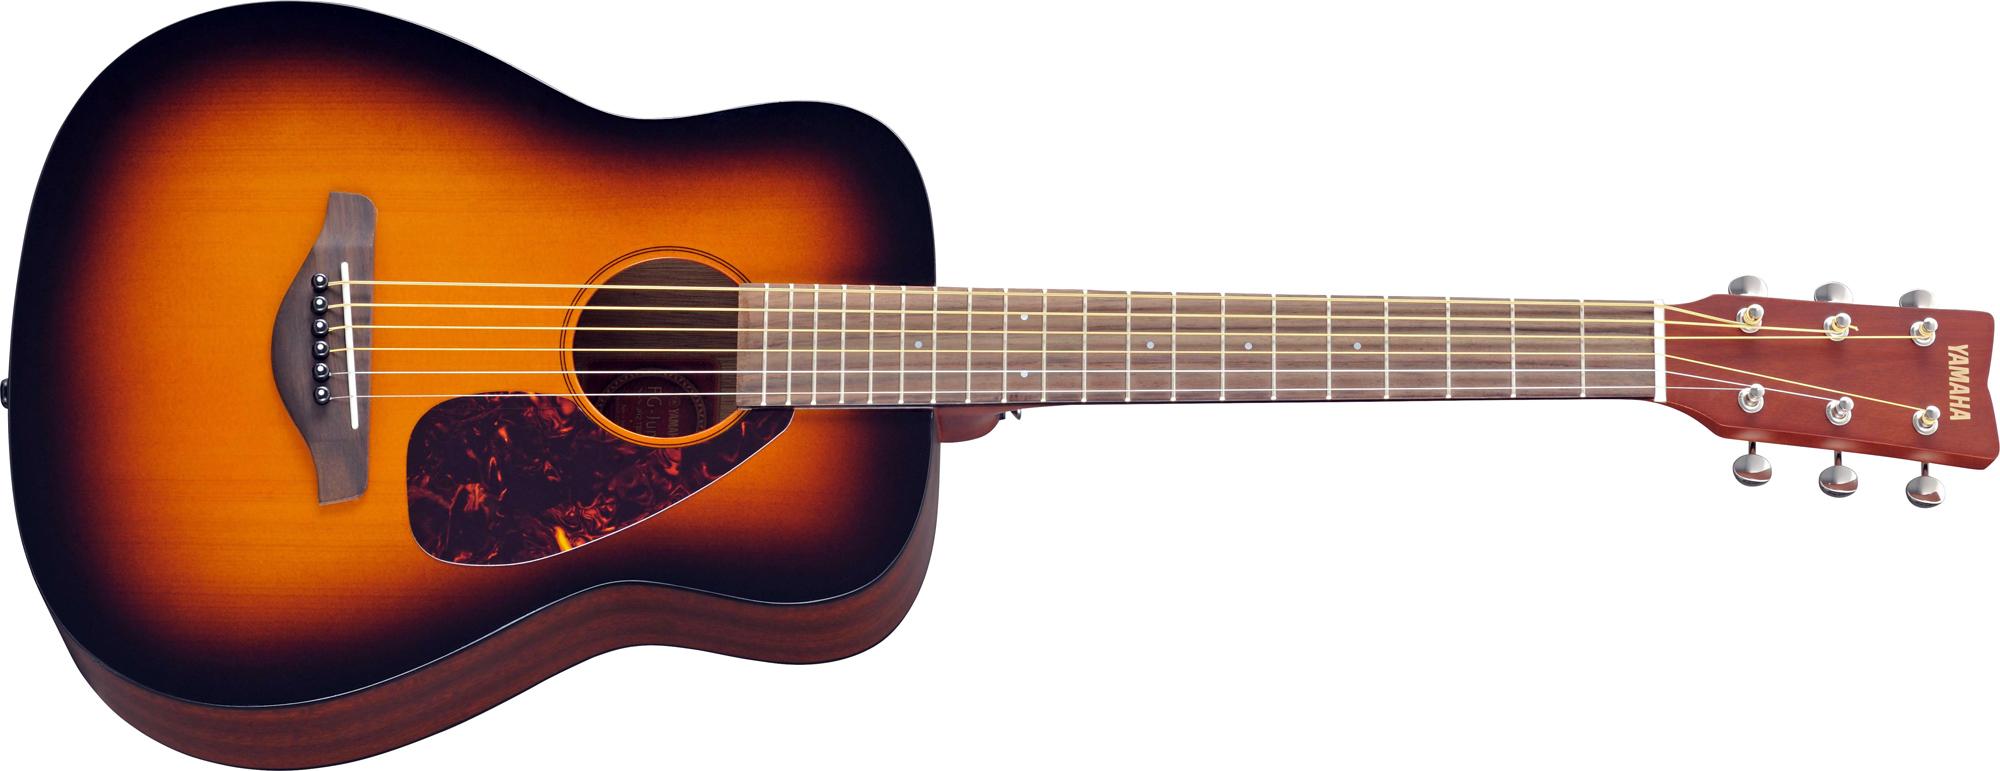 Yamaha jr2tbs 3 4 junior acoustic guitar in tobacco for Yamaha jr2 3 4